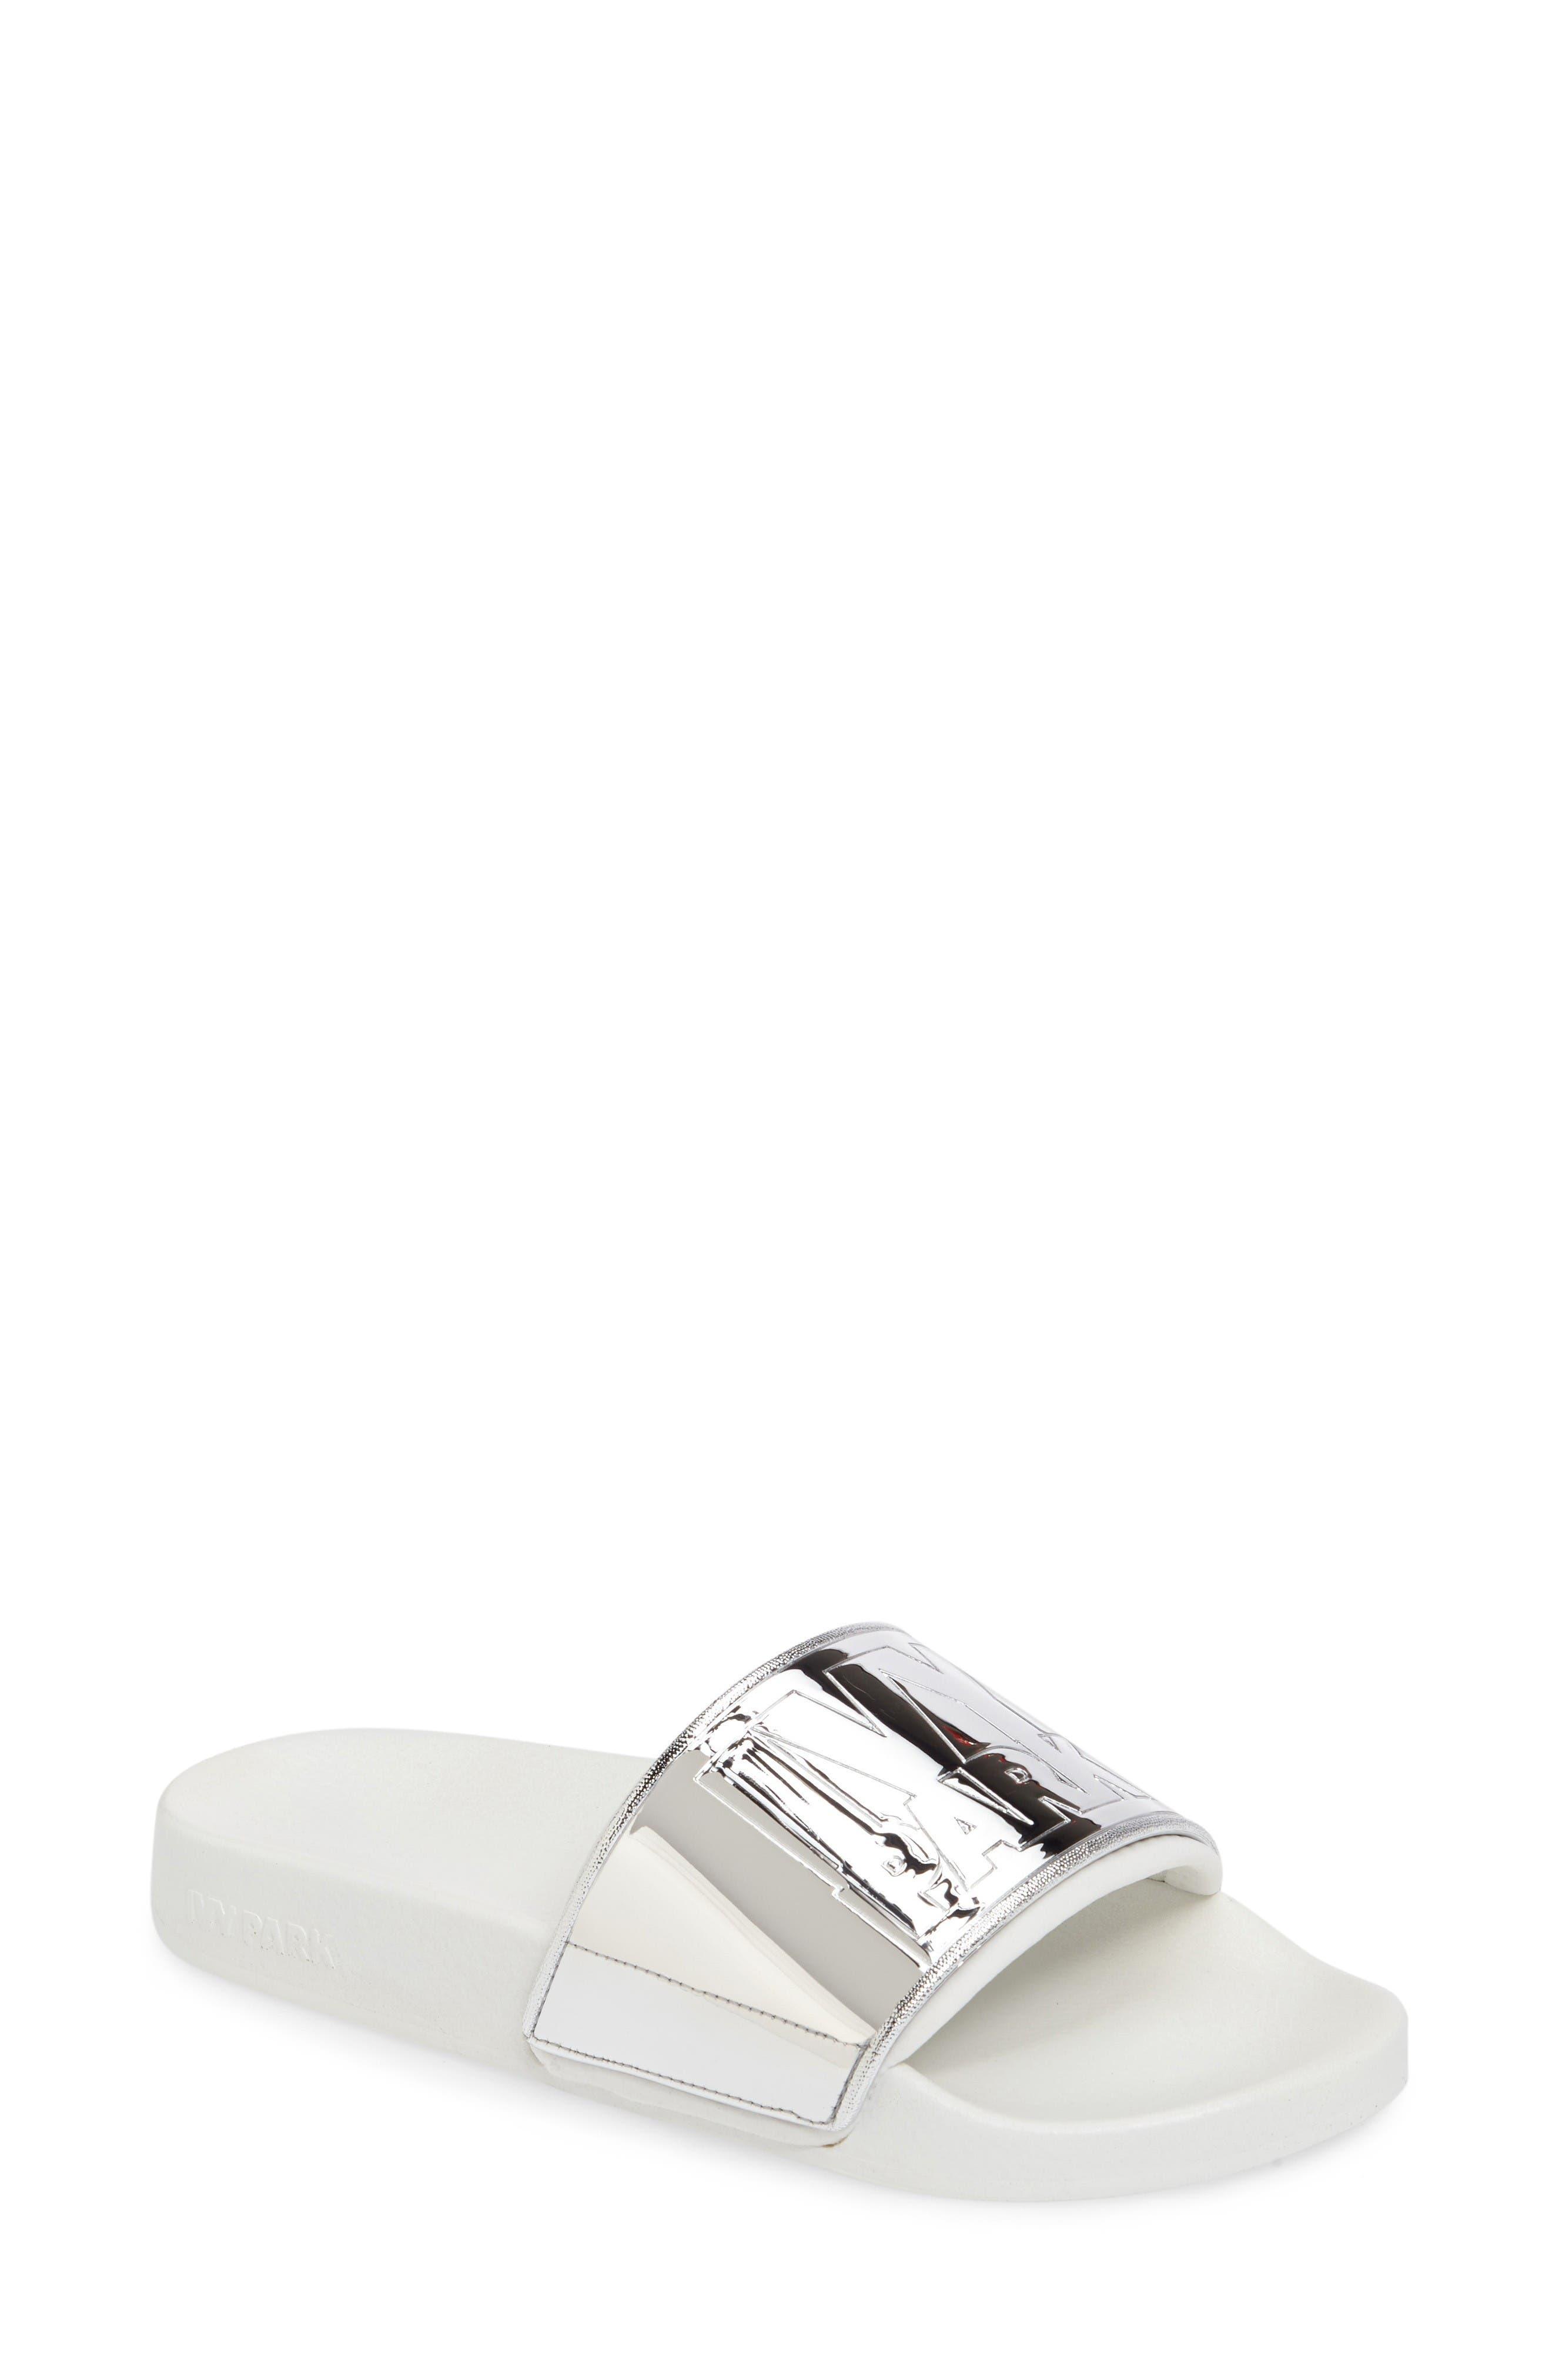 Main Image - IVY PARK® Mirror Logo Slide Sandal (Women)